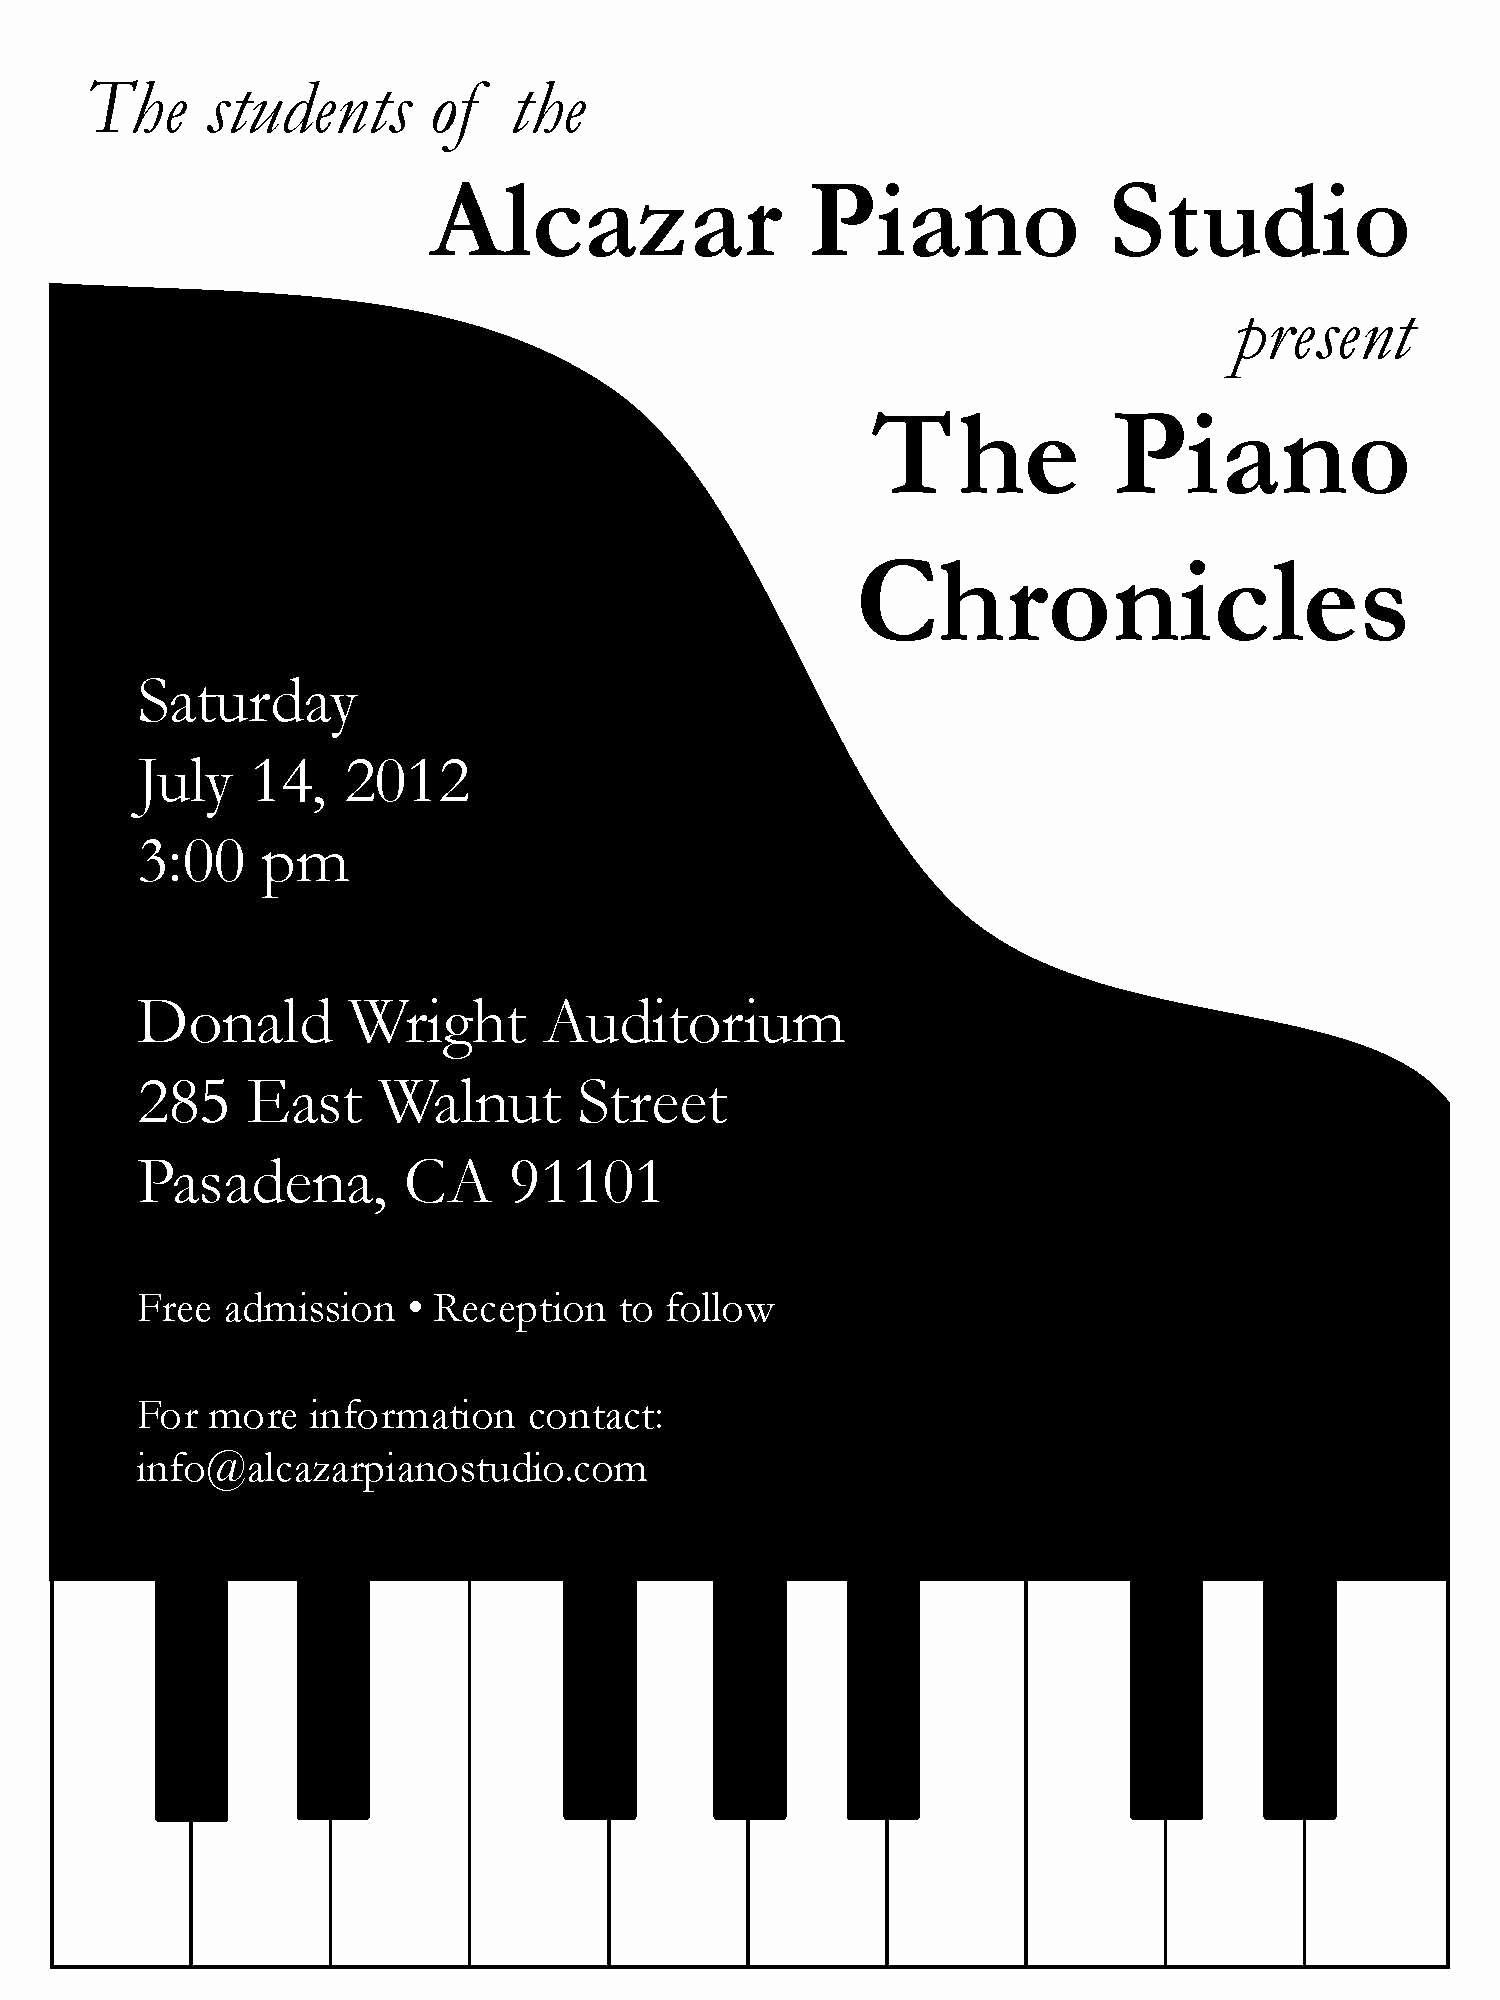 Concert Program Template Free New Piano Recital Invitation Stuff I Make